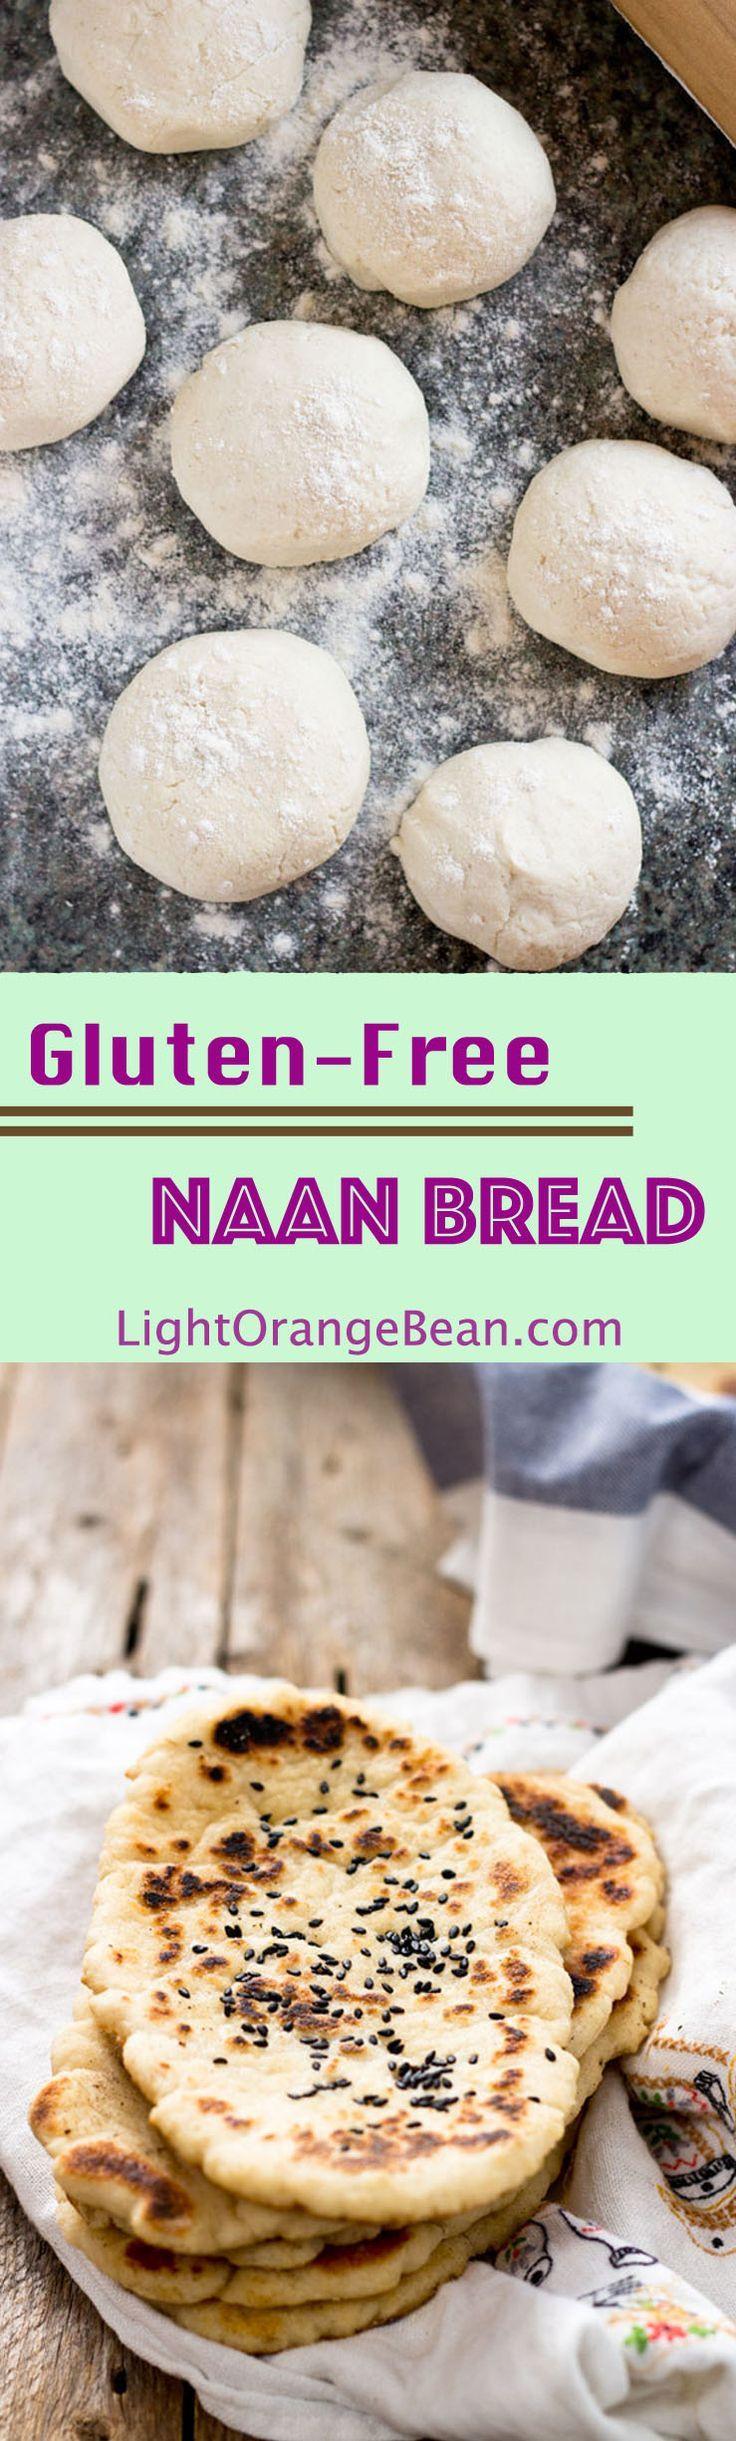 Gluten Free Indian Bread  Best 25 Gluten free ideas on Pinterest